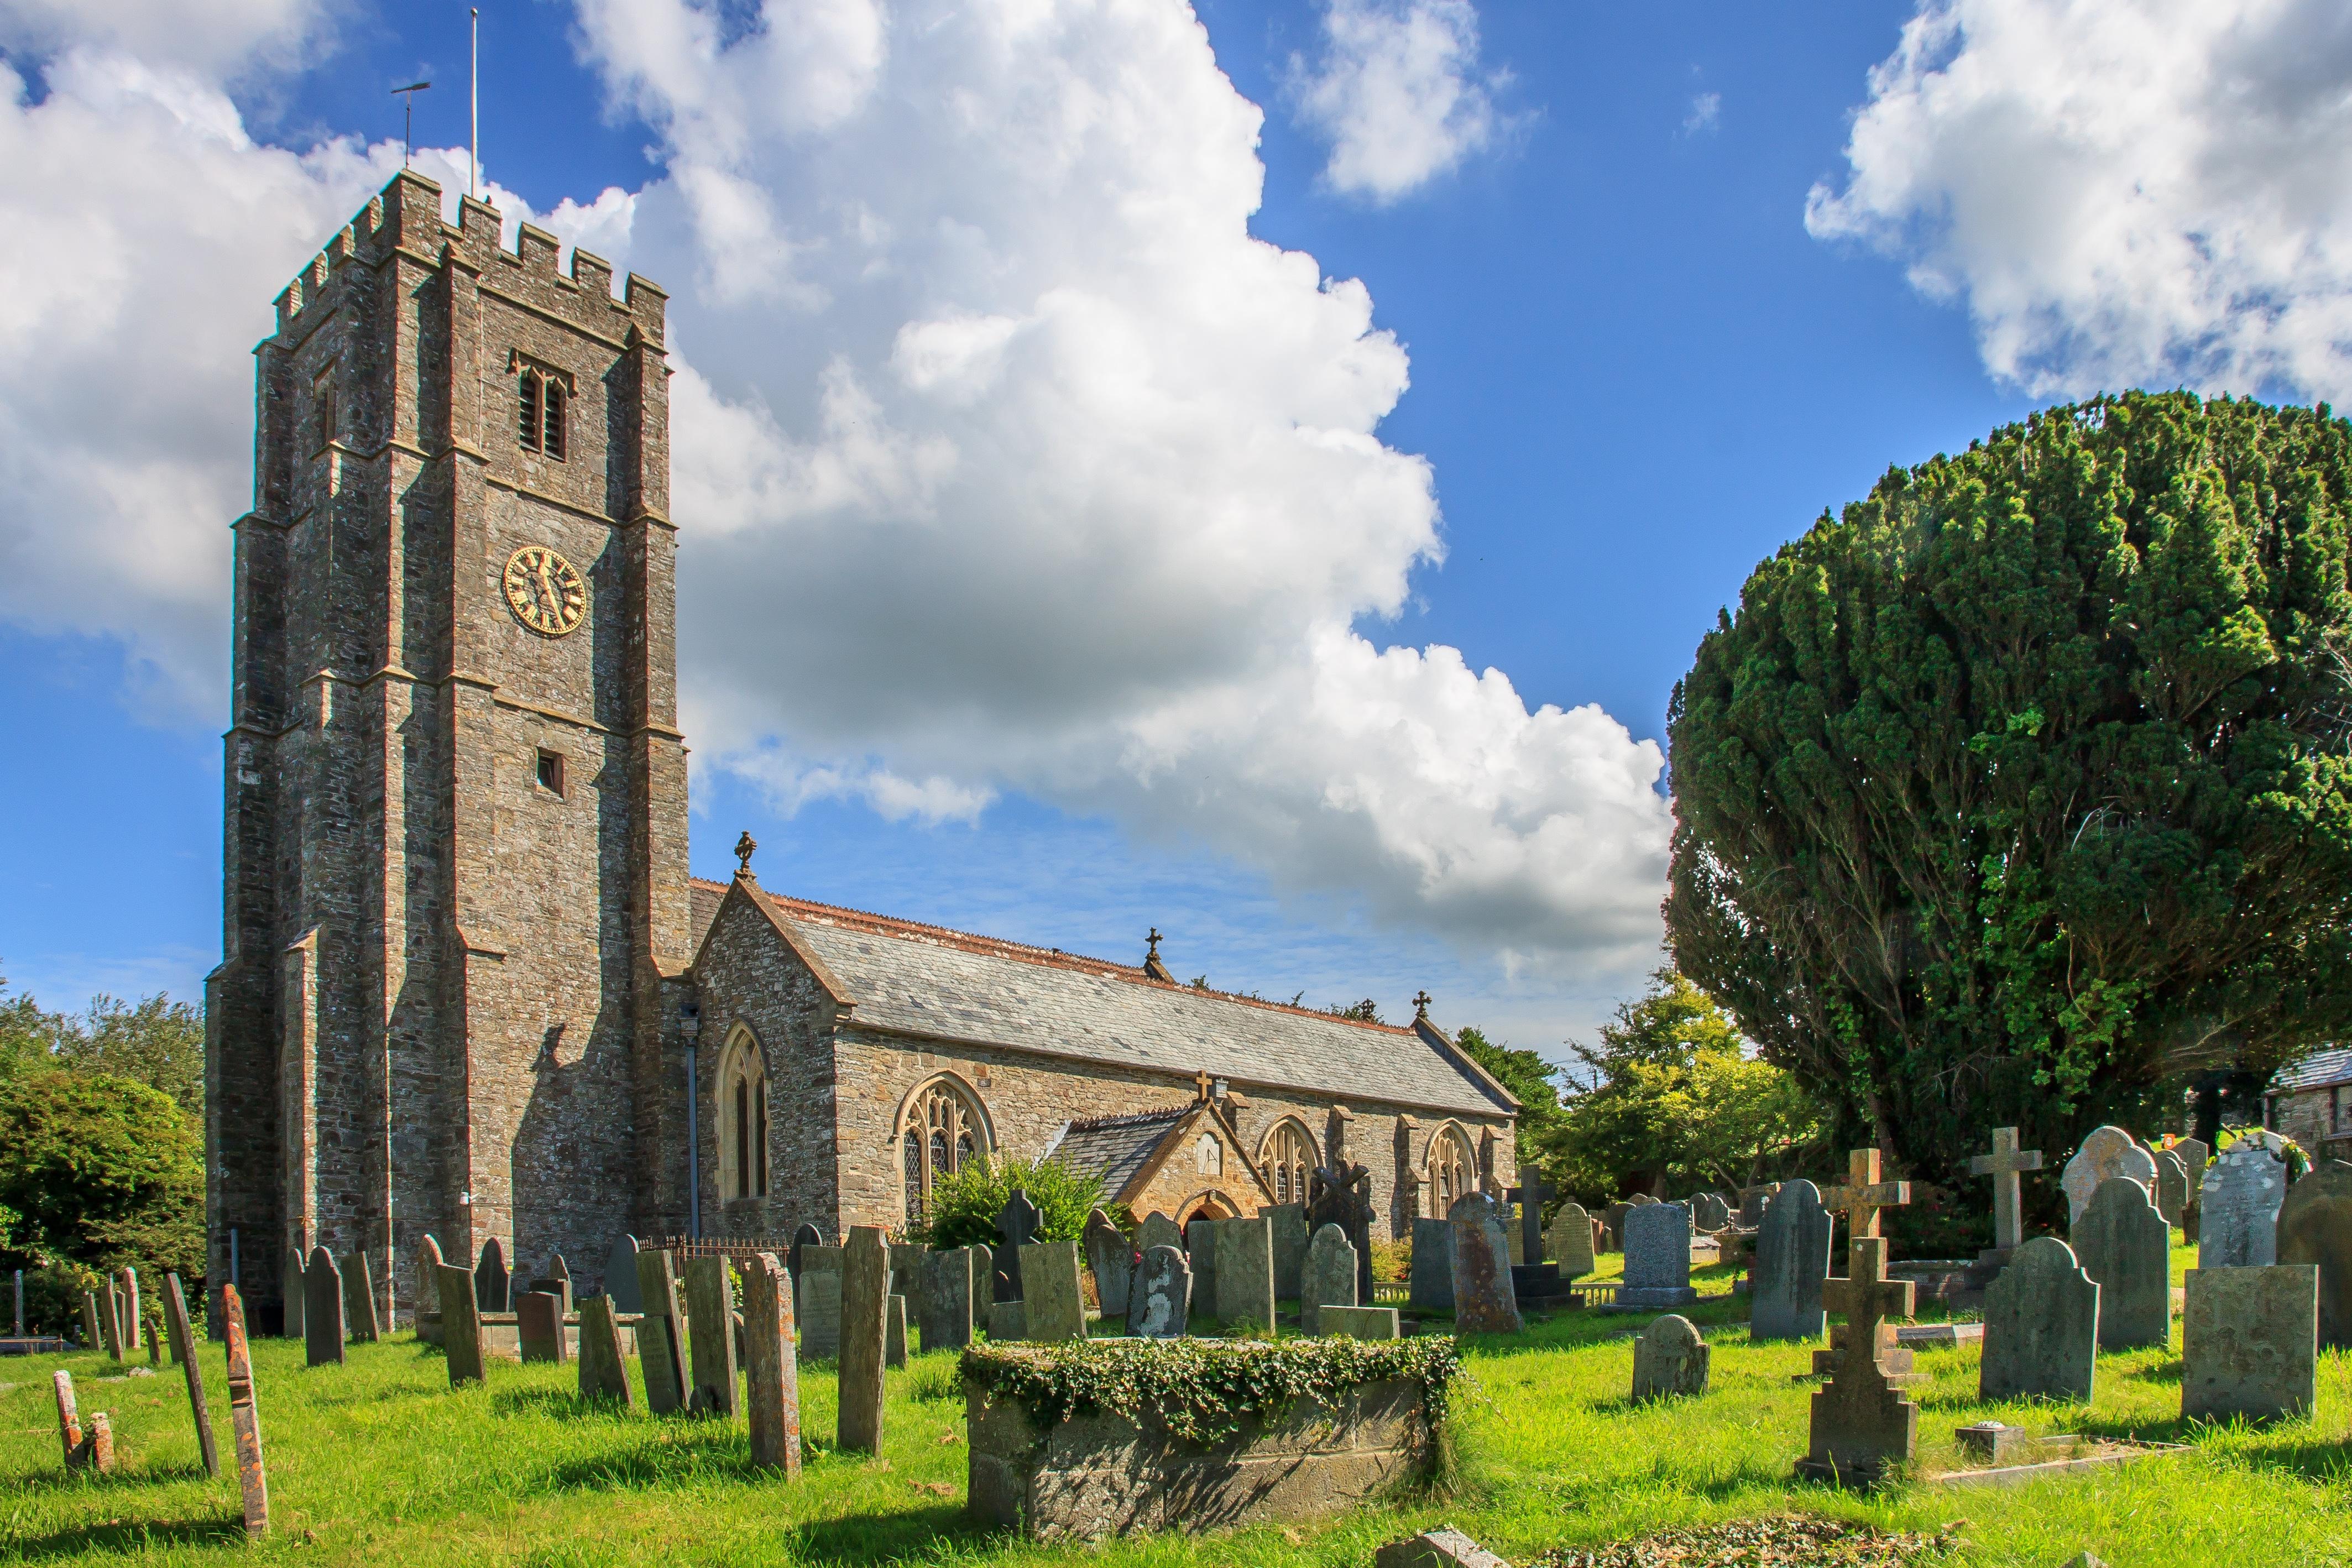 April: St George's Church